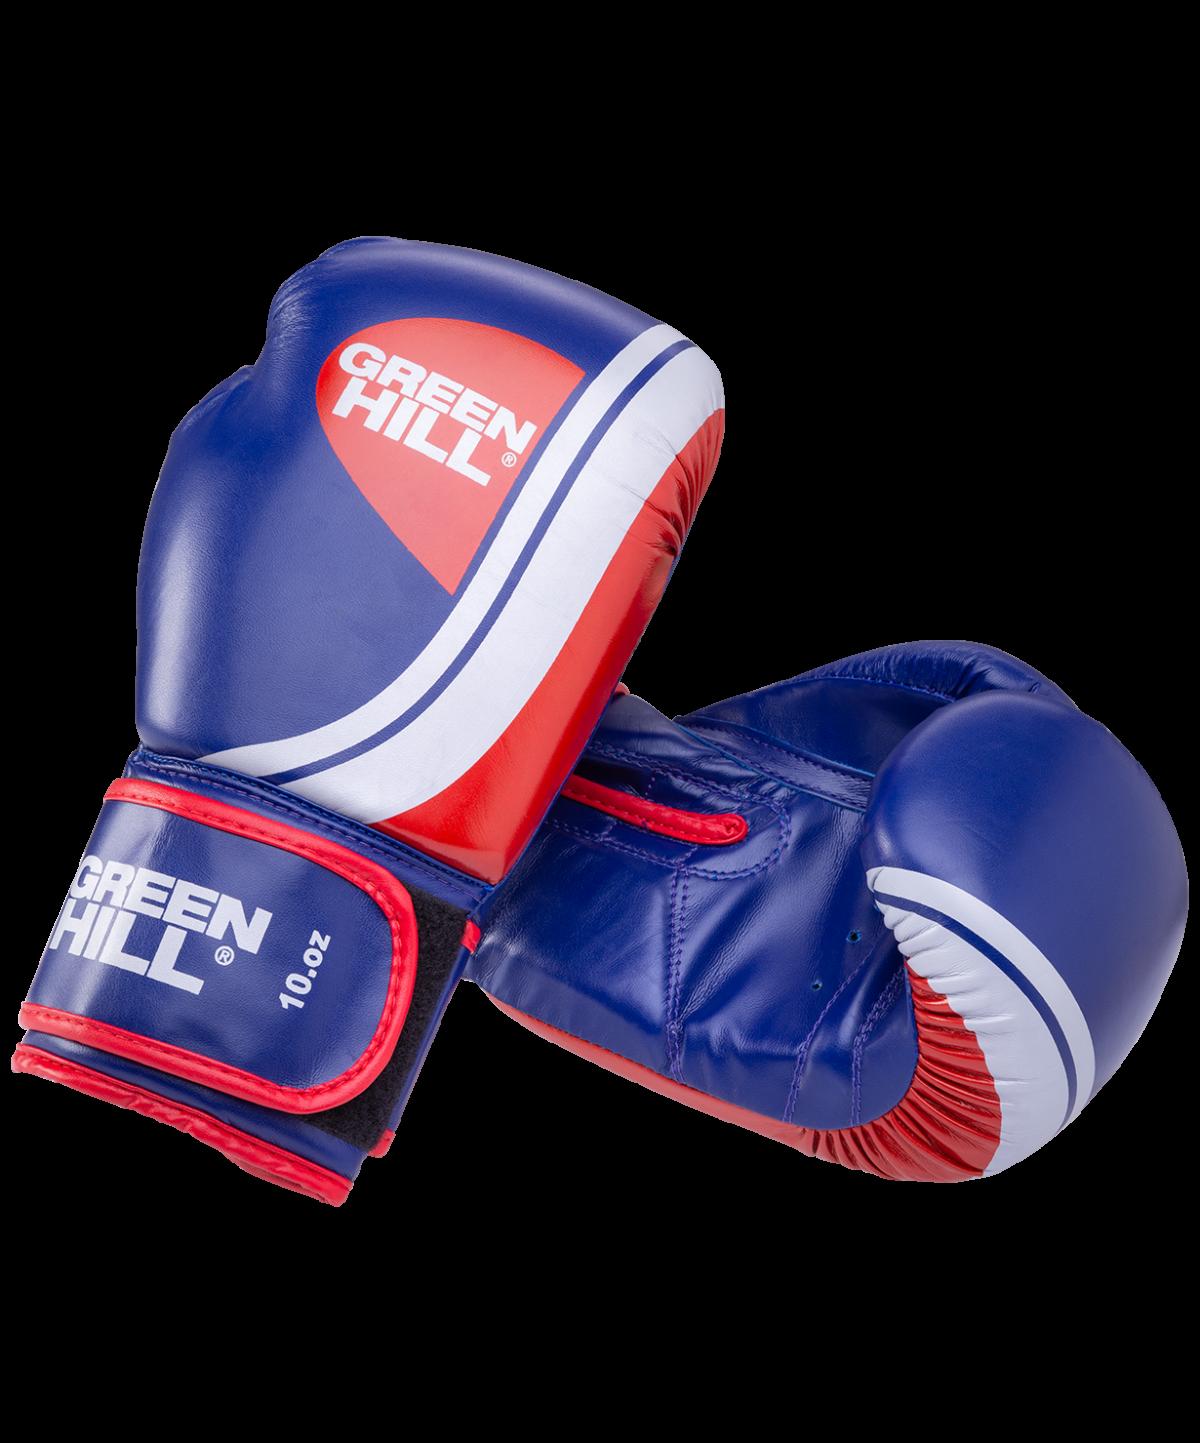 GREEN HILL Перчатки боксерские 10 oz Knockout  BGK-2266: синий - 1